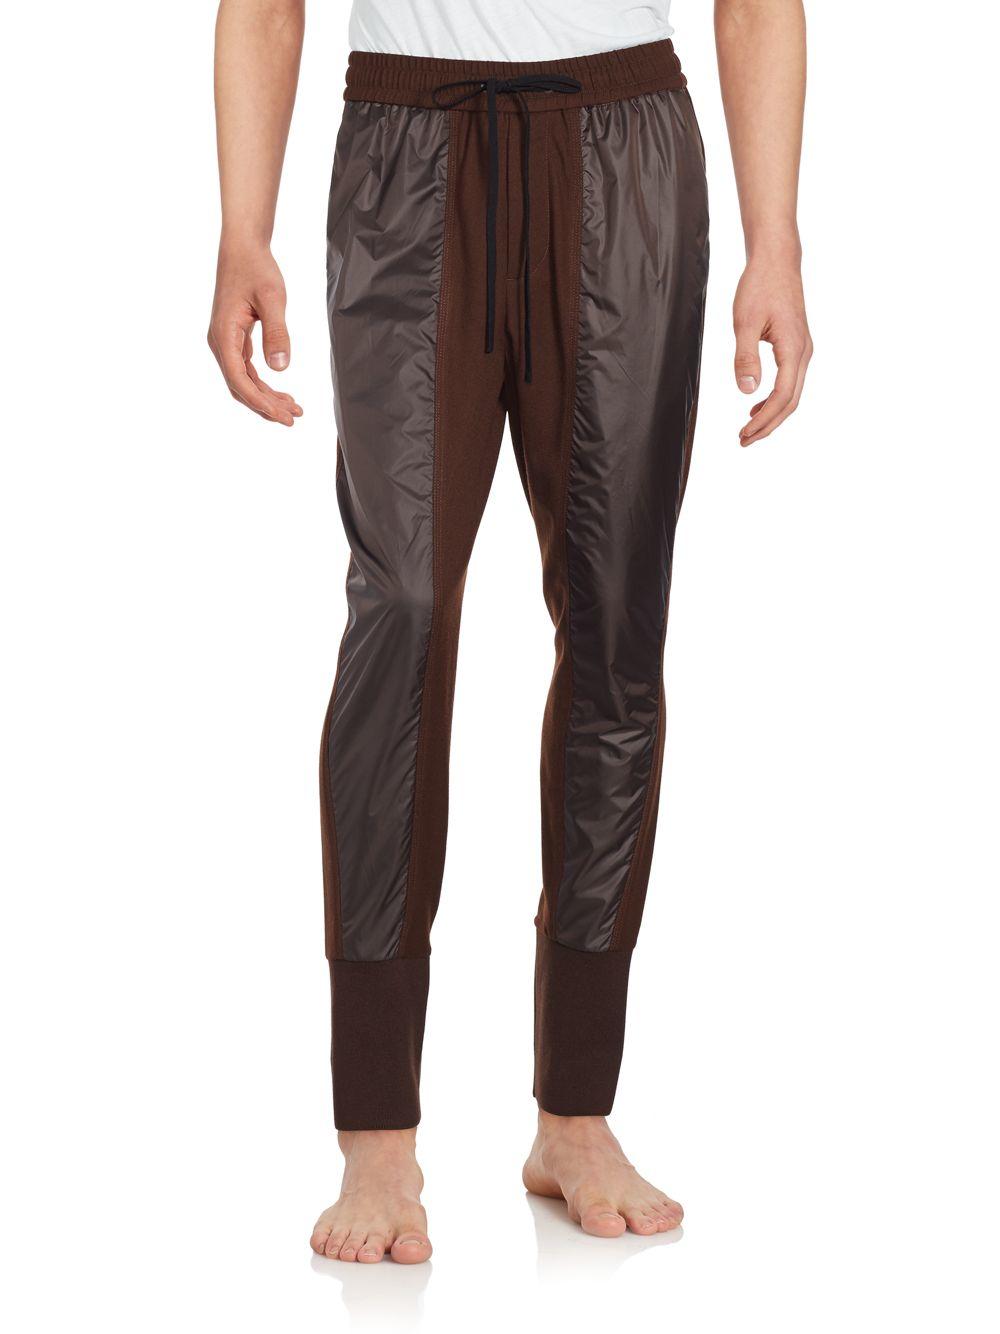 3.1 phillip lim Contrast Inset Drawstring Pants for Men